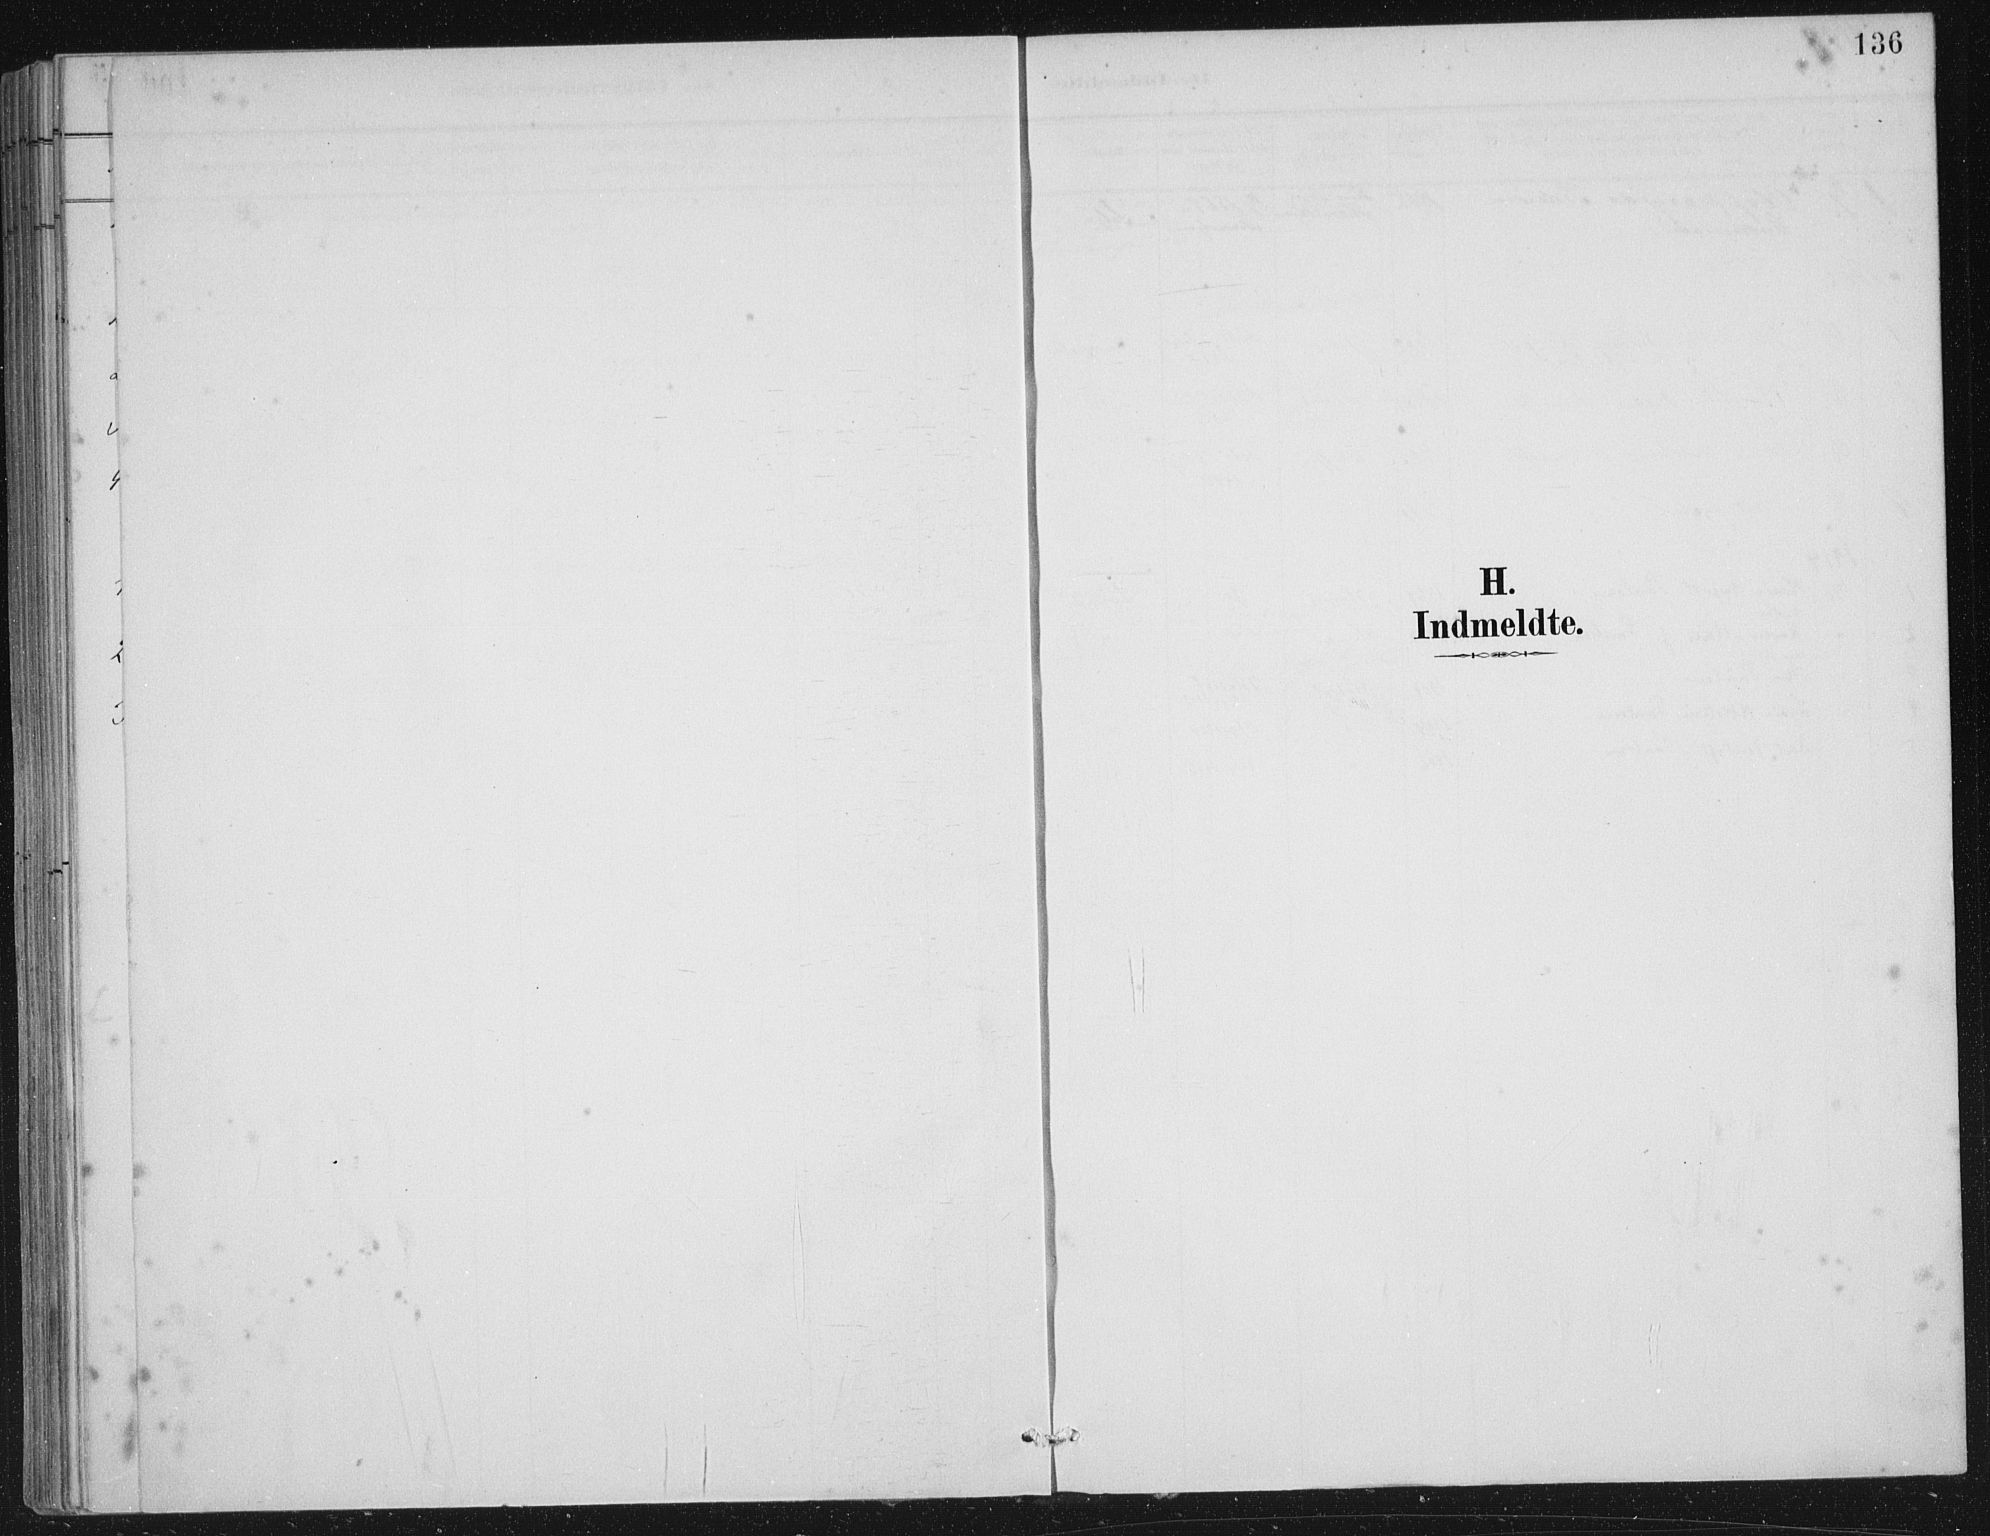 SAB, Kinn sokneprestembete, H/Haa/Haae/L0001: Parish register (official) no. E 1, 1890-1916, p. 136